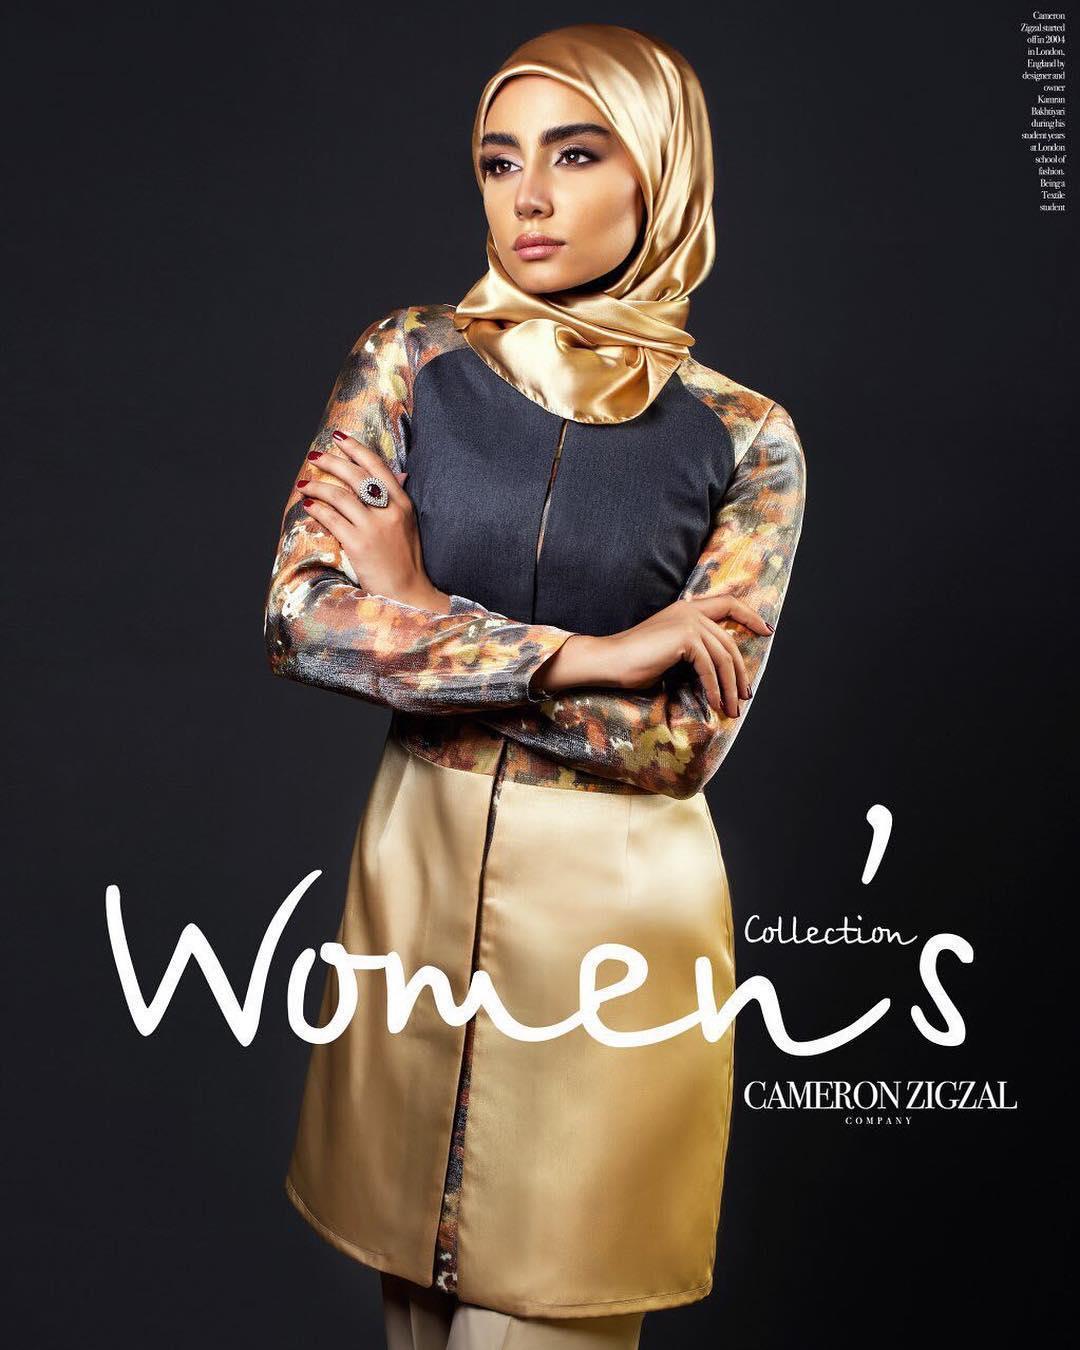 ⚜️ Cz Women ⚜️ ☎️Showroom: 02